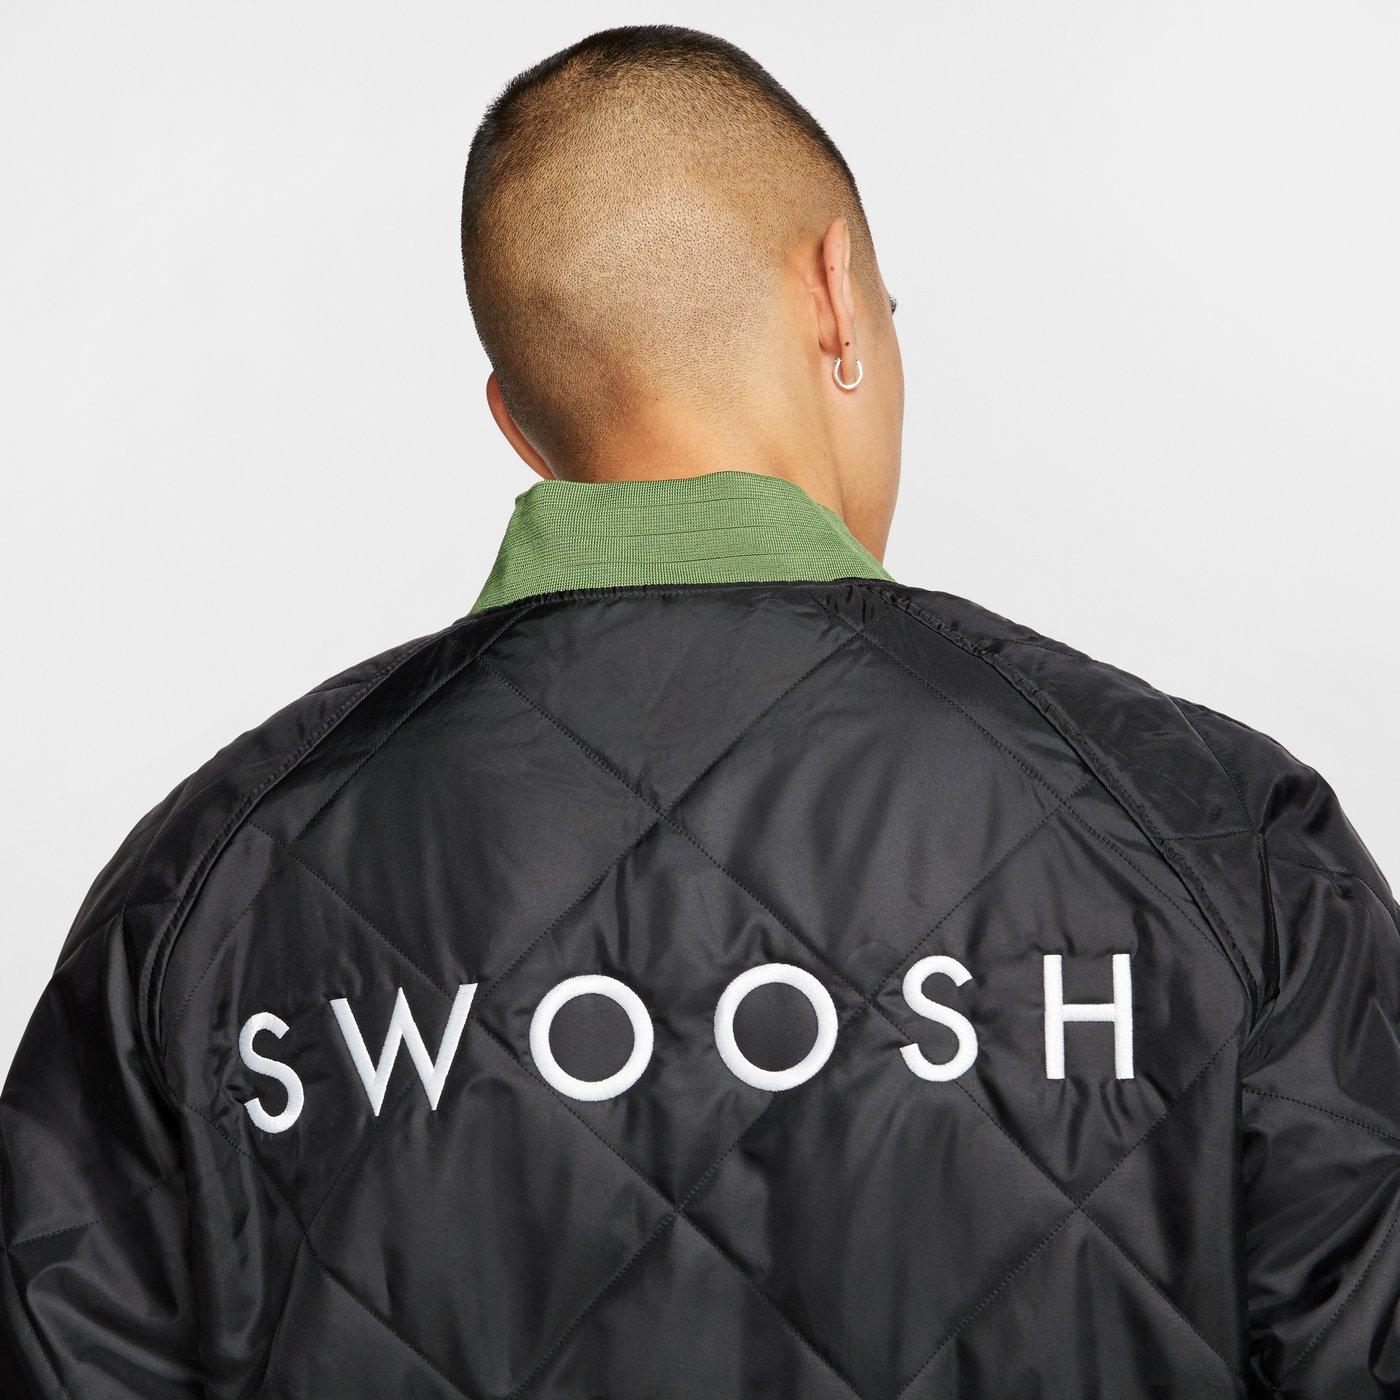 Nike Sportswear Swoosh Bomber Çift Taraflı Erkek Yeşil-Siyah Ceket